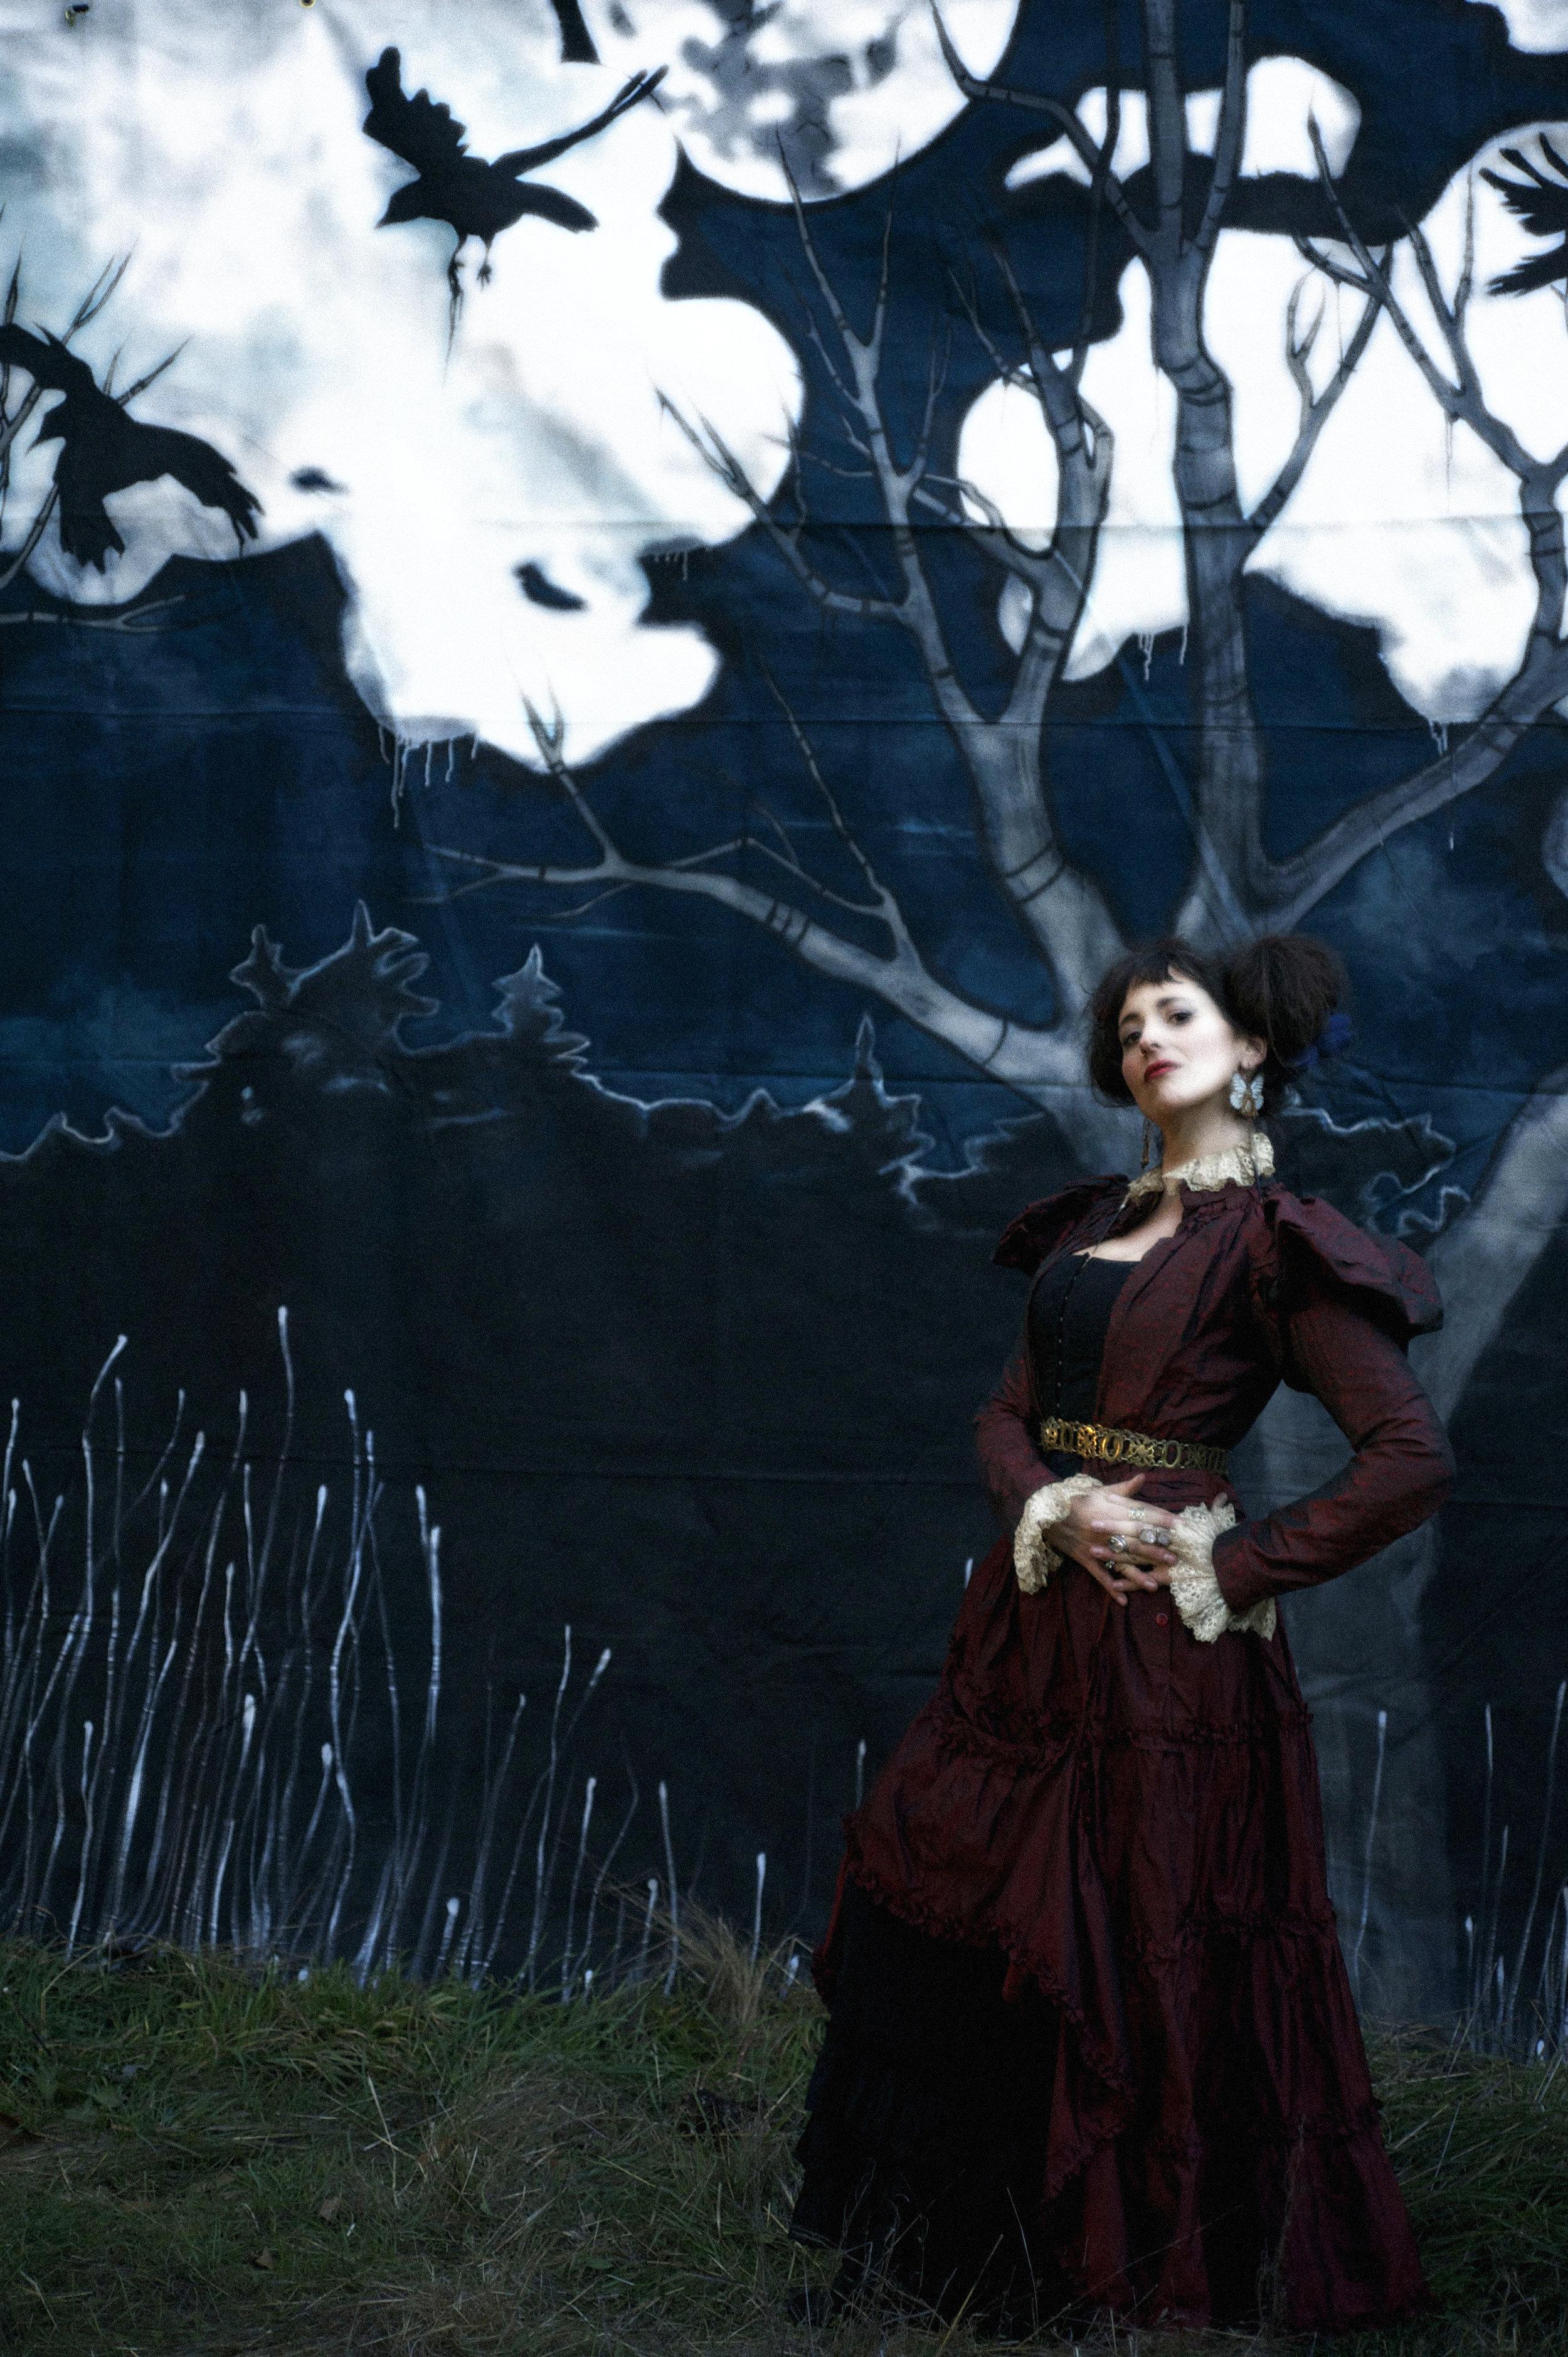 Layla pirate 4.jpg